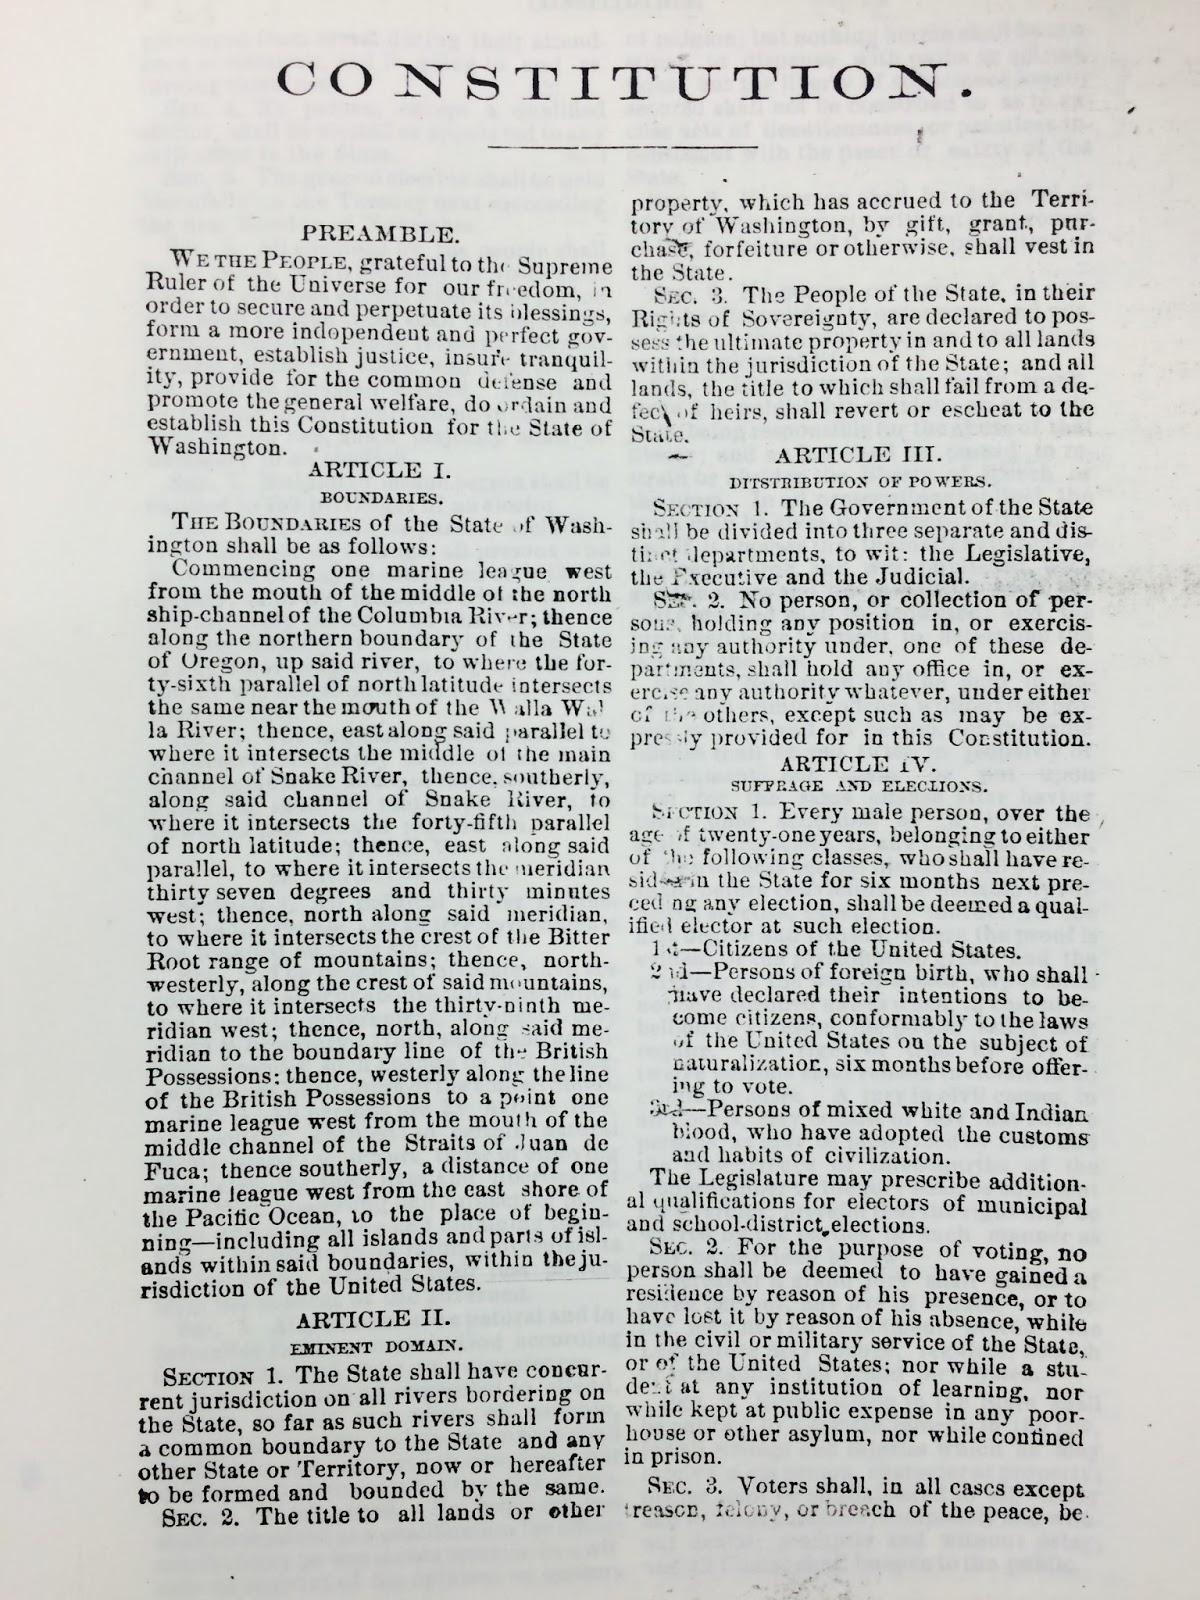 article times regarding this miami express constitution